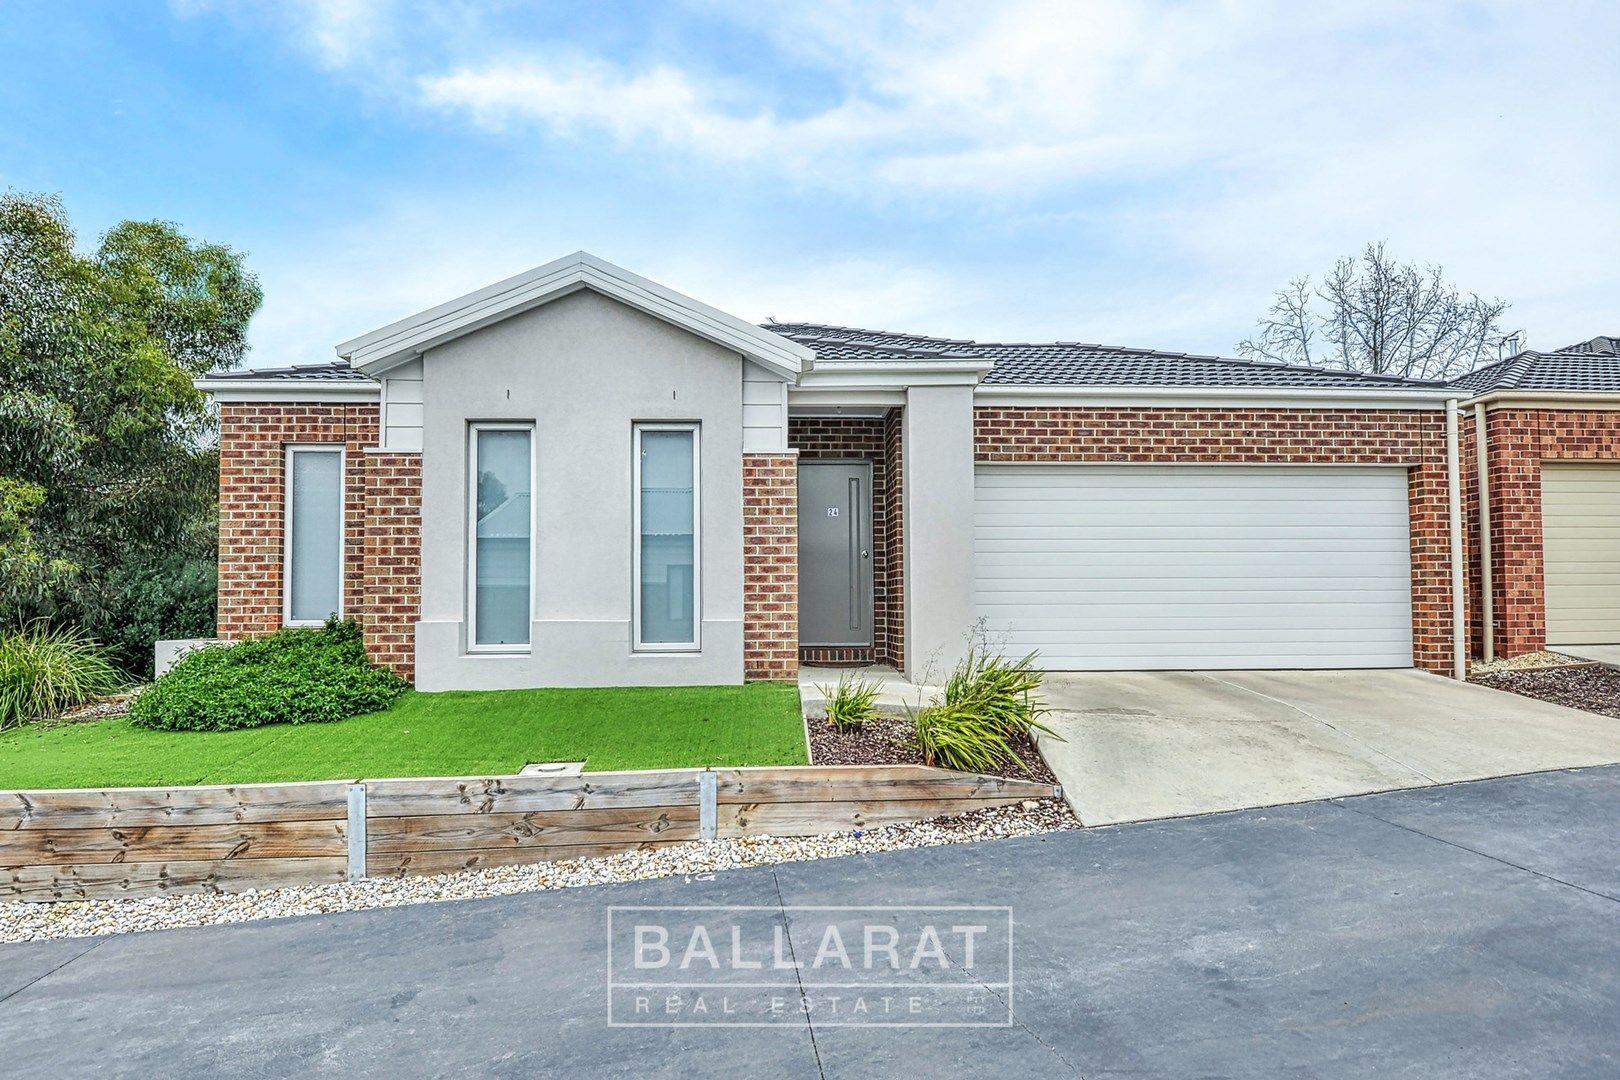 24 Millicent Place, Ballarat East VIC 3350, Image 0